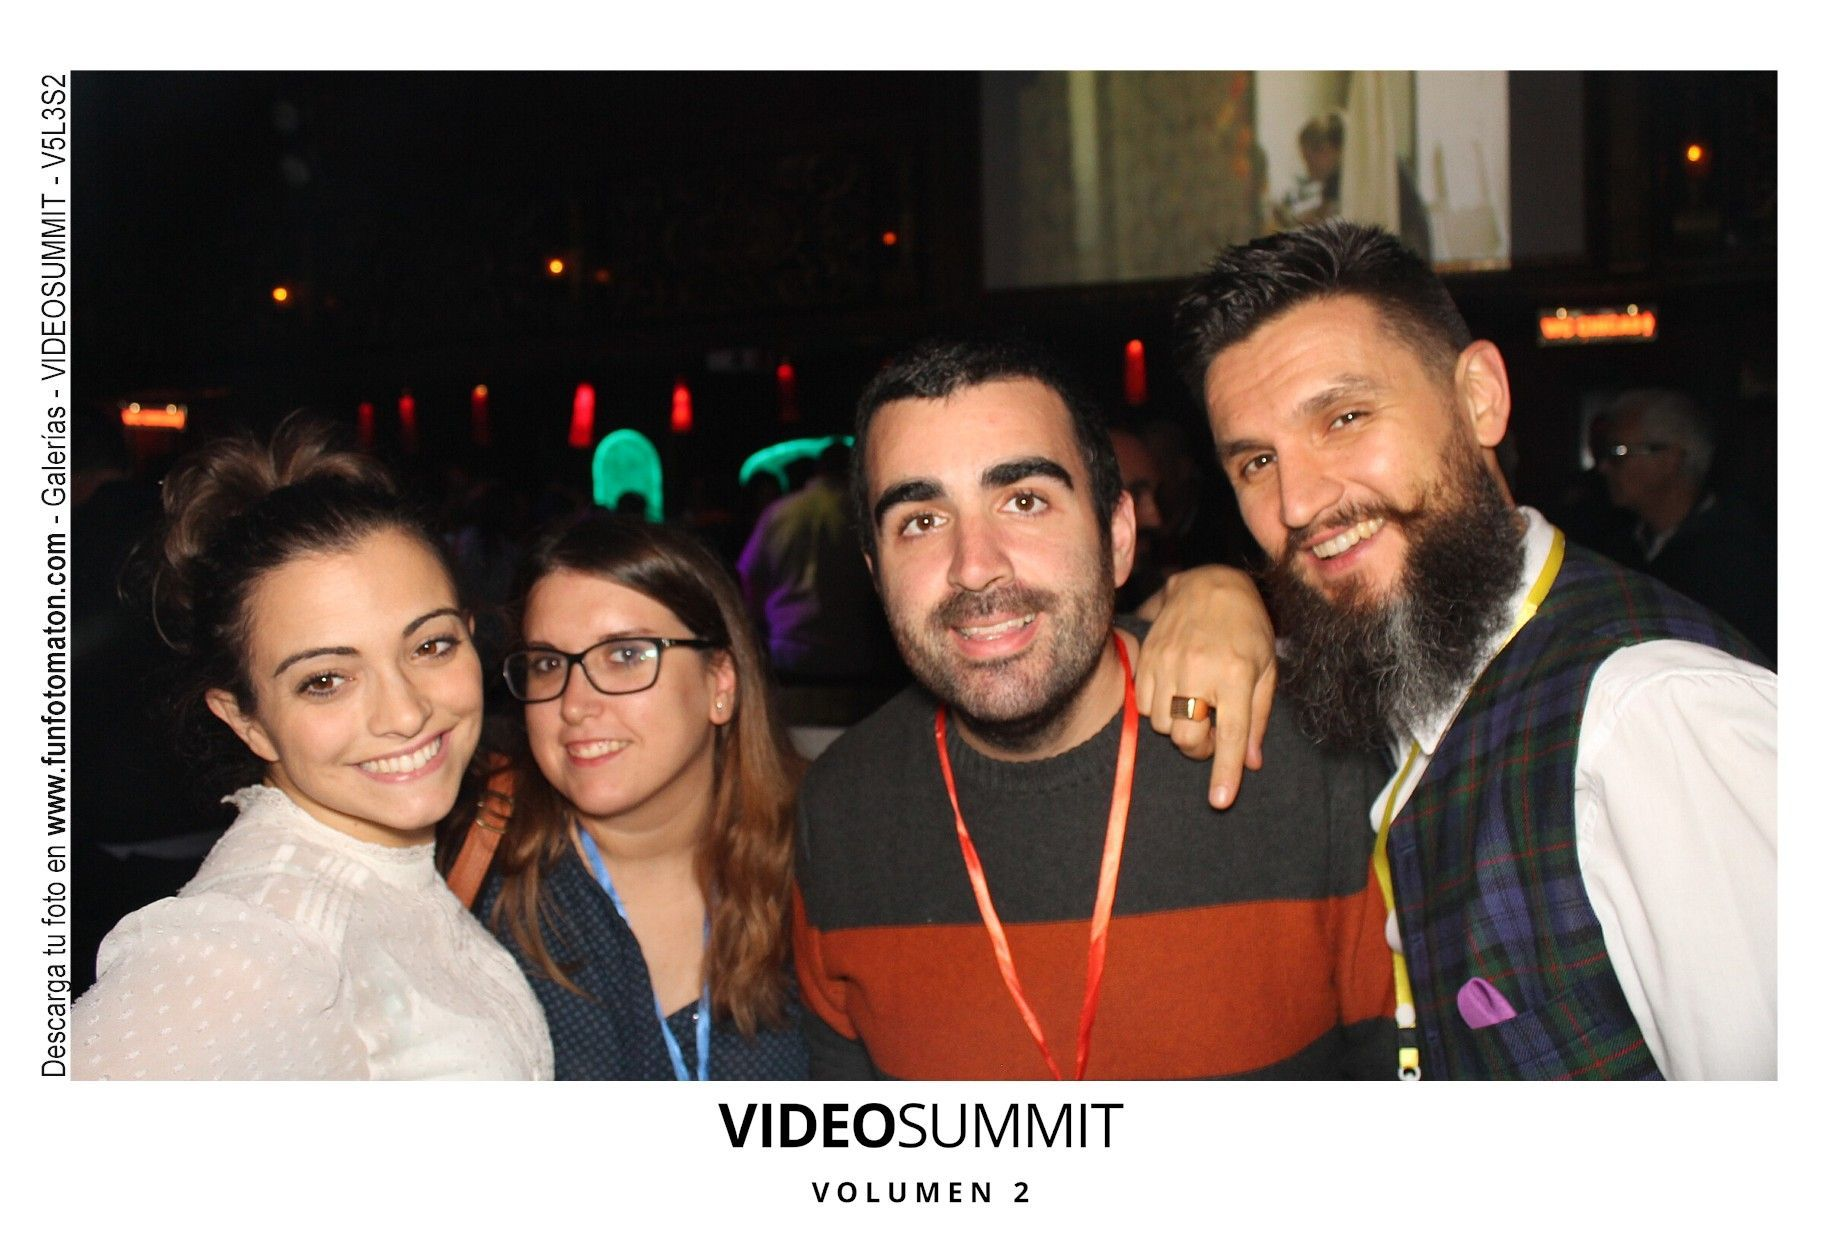 videosummit-vol2-club-party-029